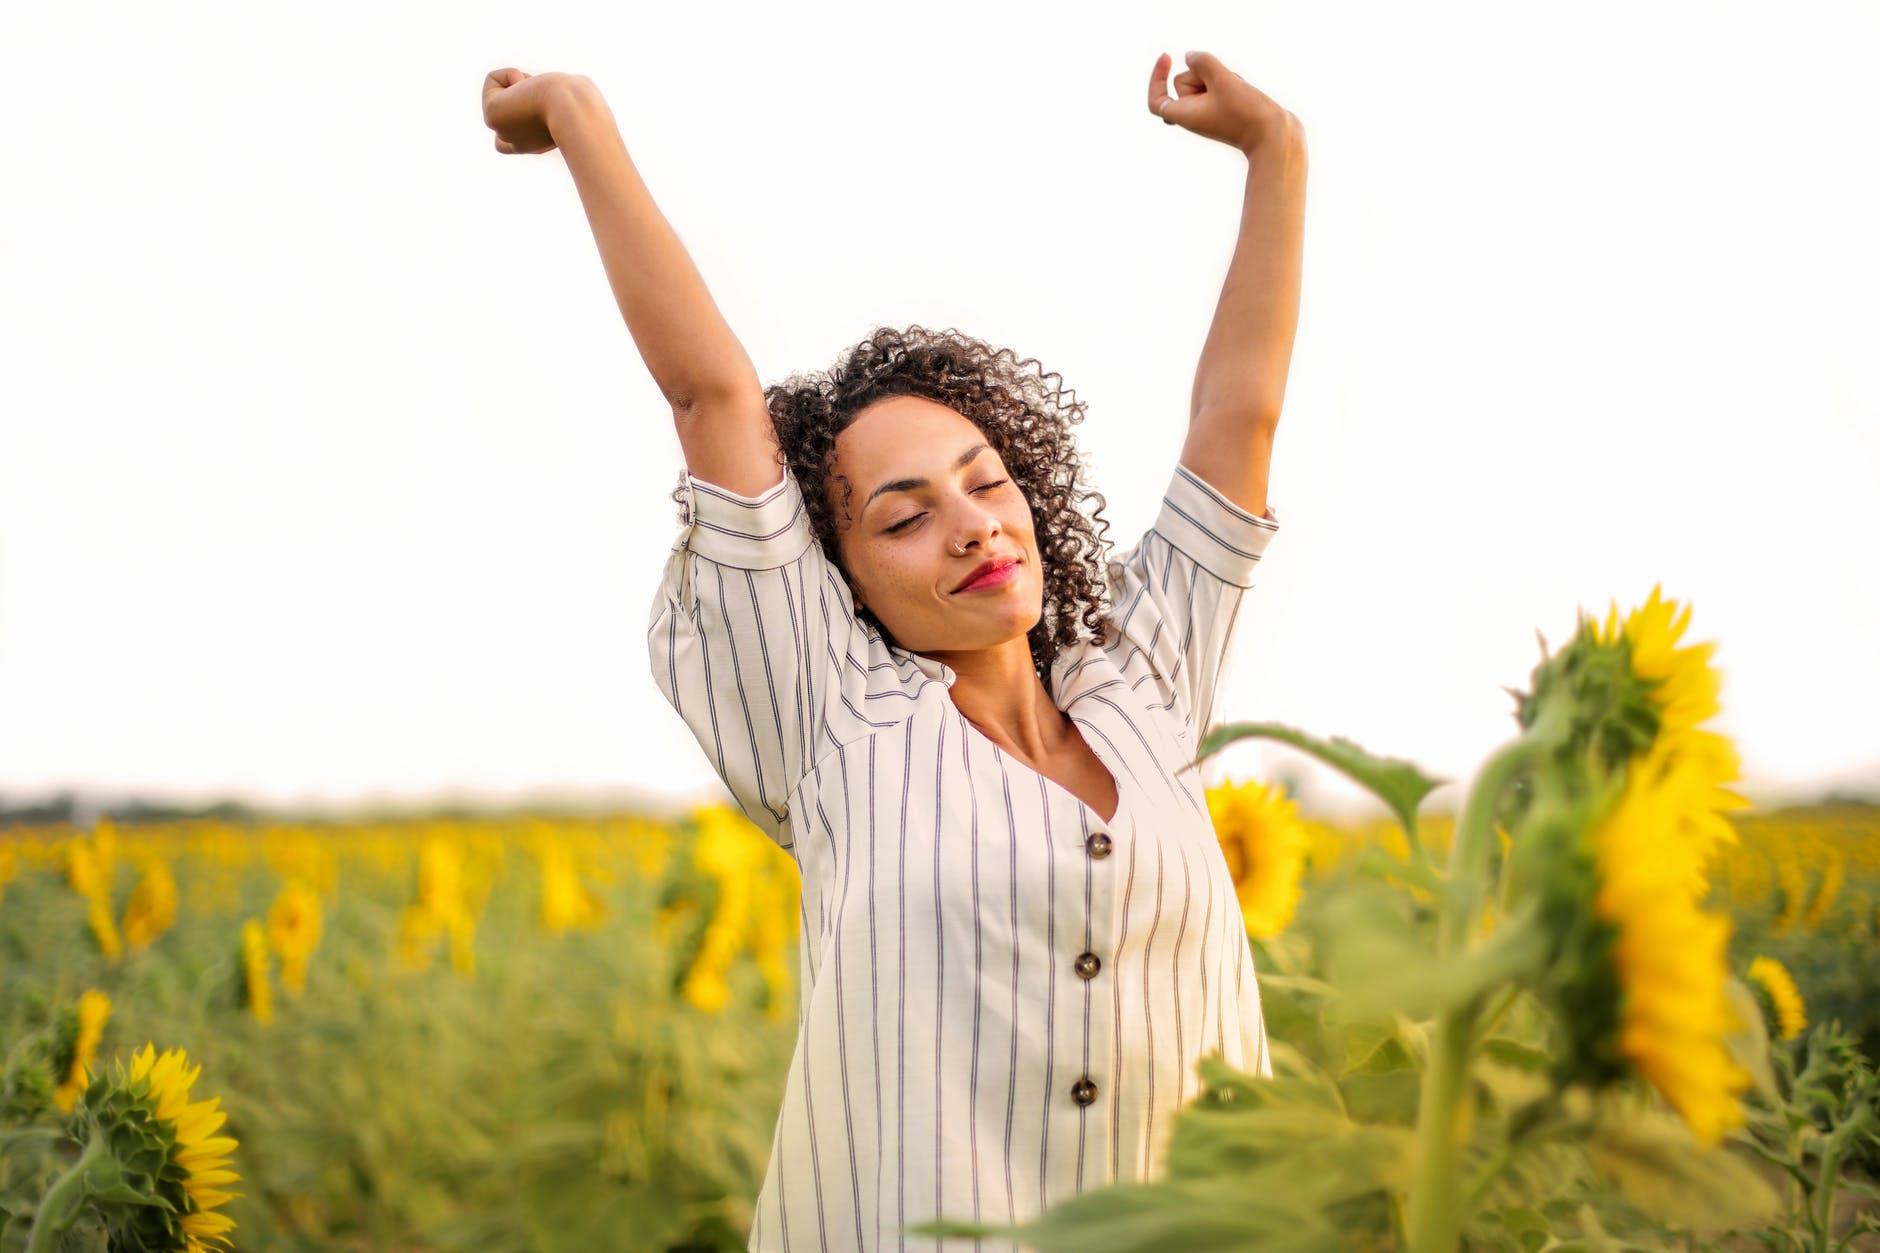 Liberté et cycle menstruel naturel